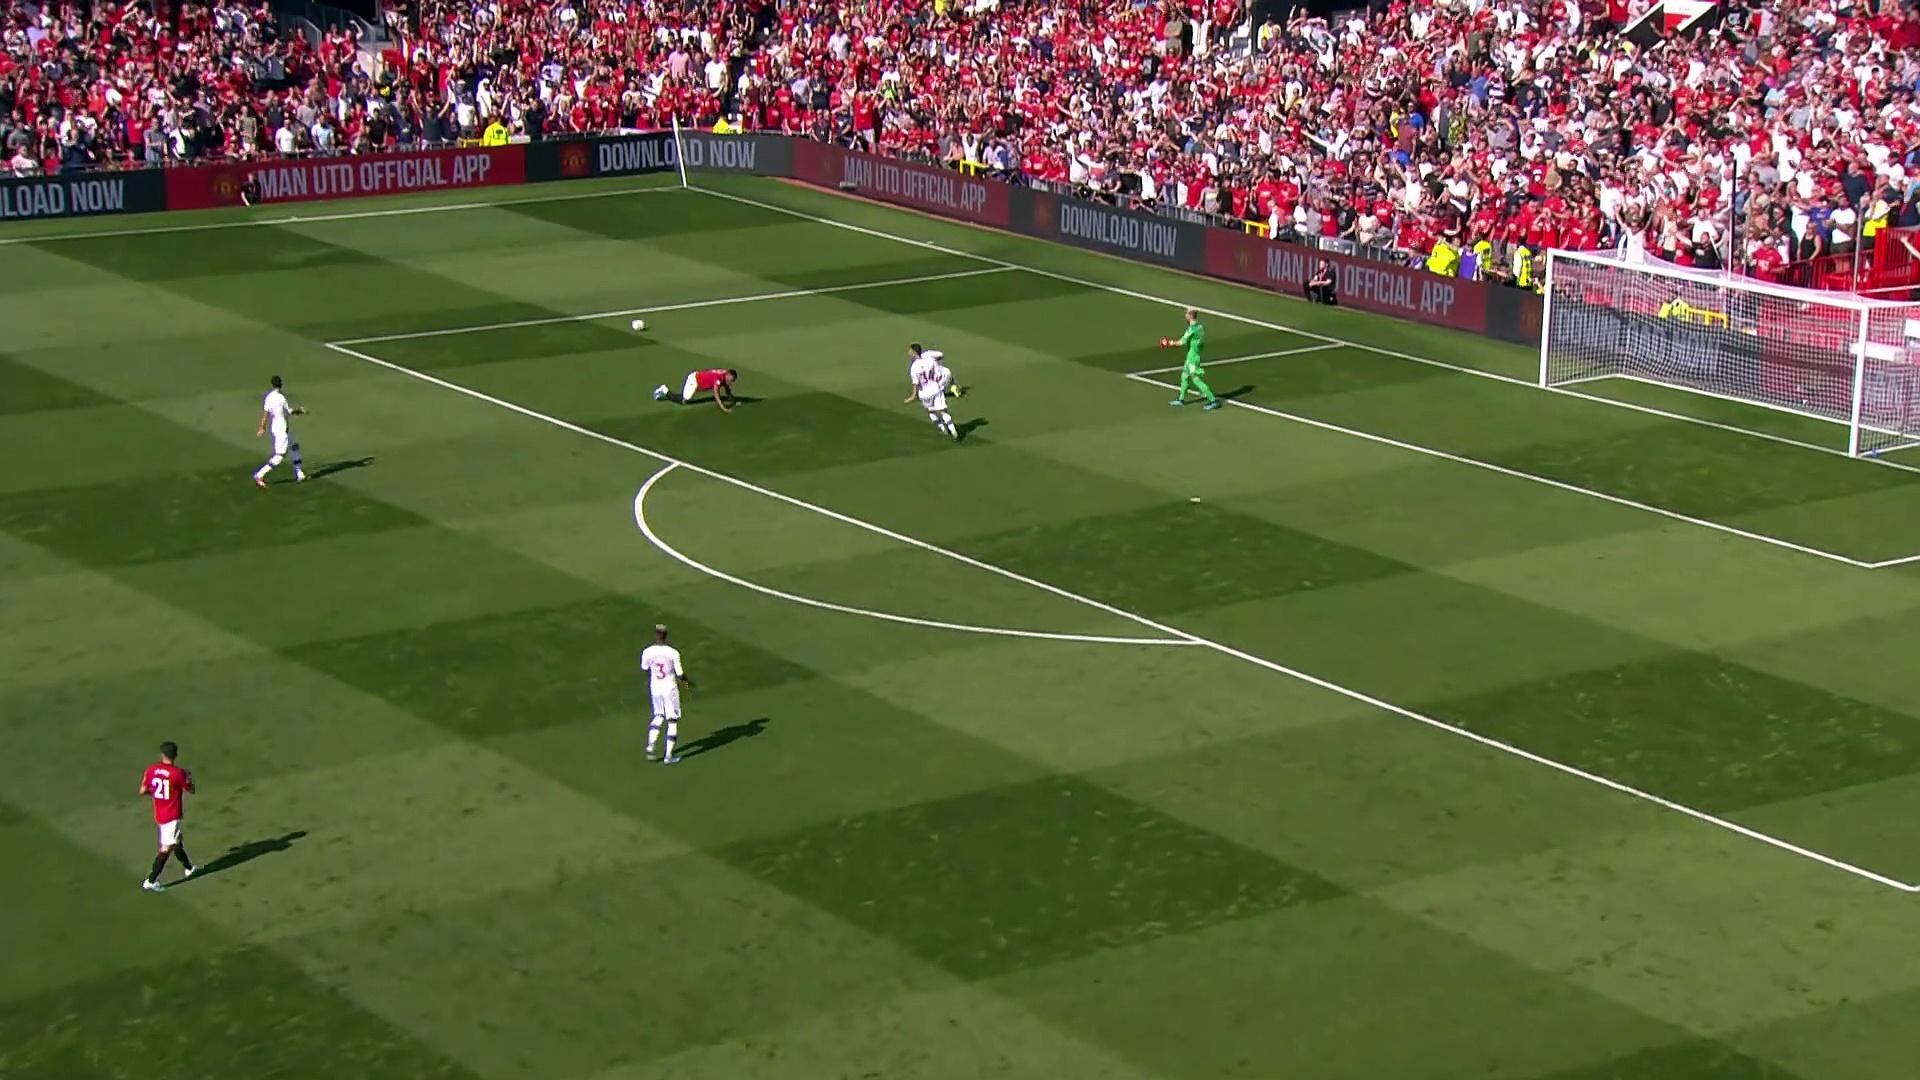 3. Hafta / Manchester United - Crystal Palace: 1-2 (Özet)